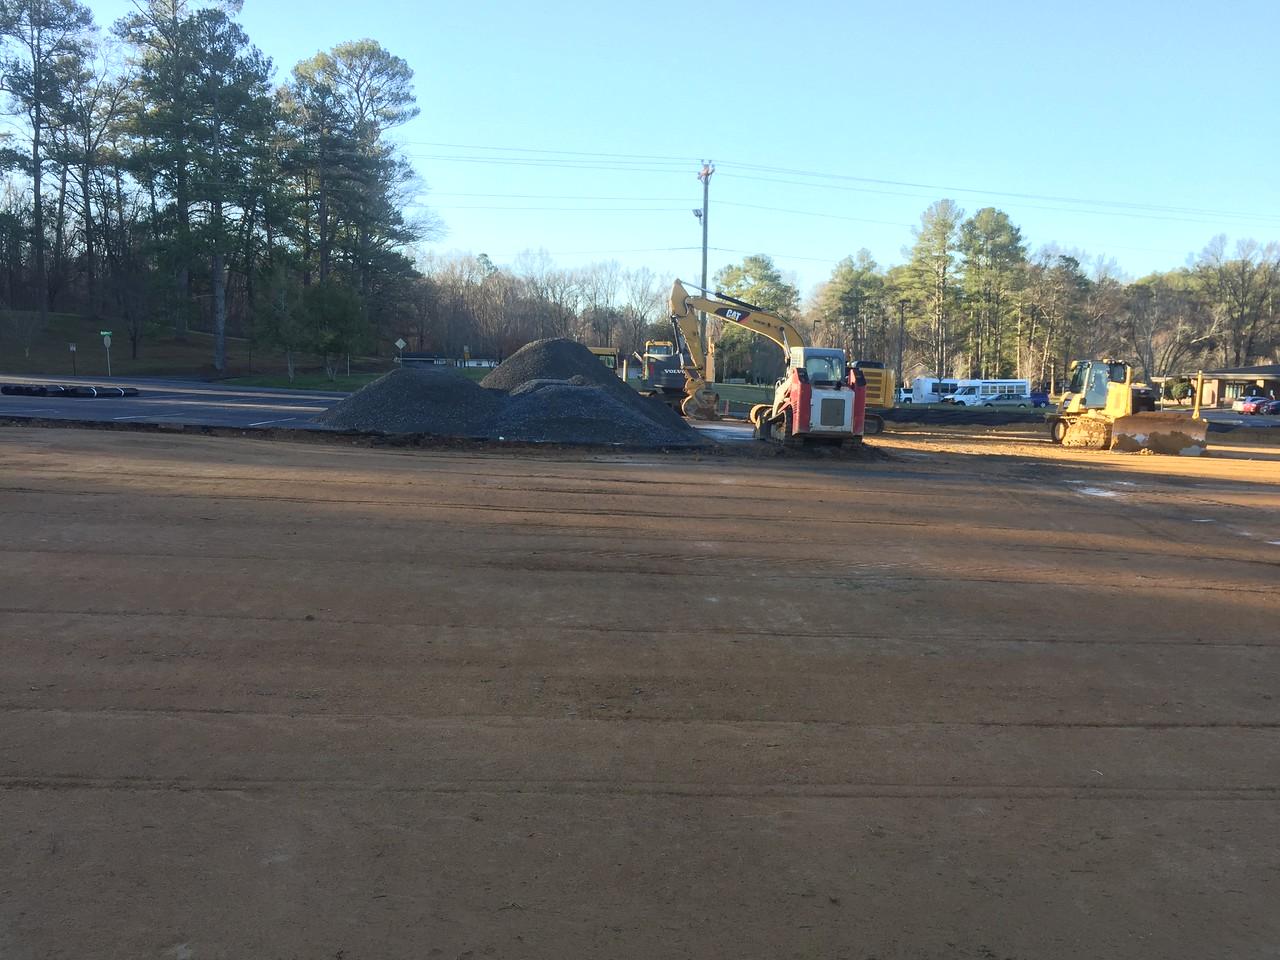 Main Parking Lot, January 26, 2017